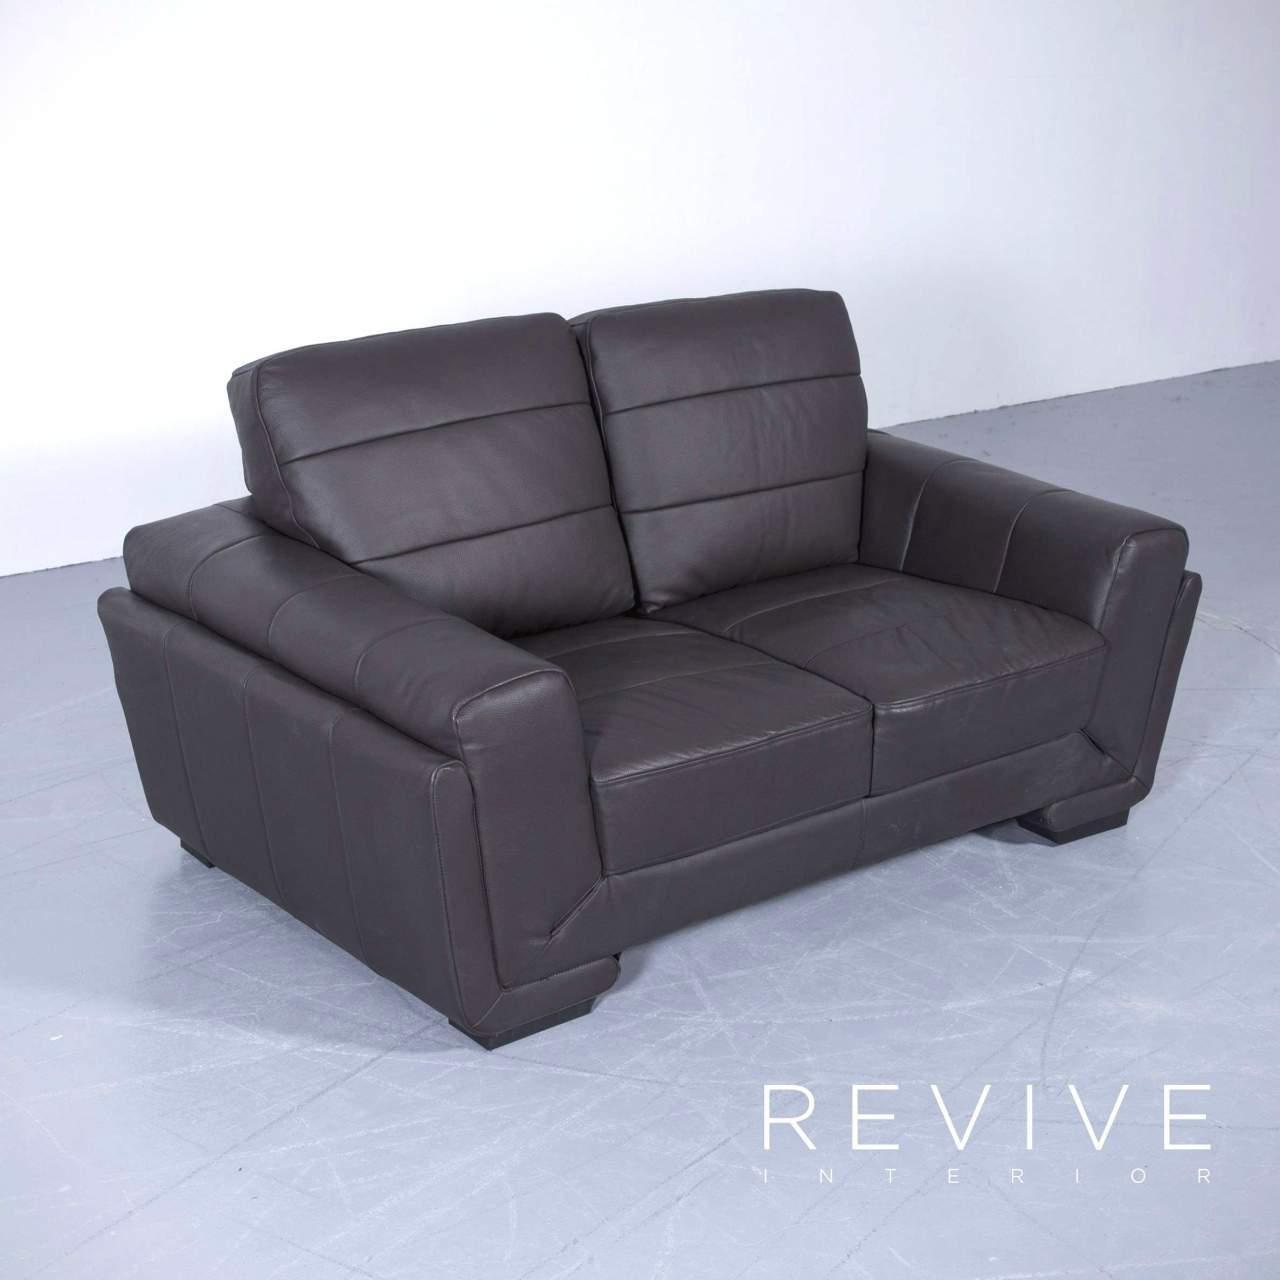 couch garten genial sofa bed couch procura home blog of couch garten